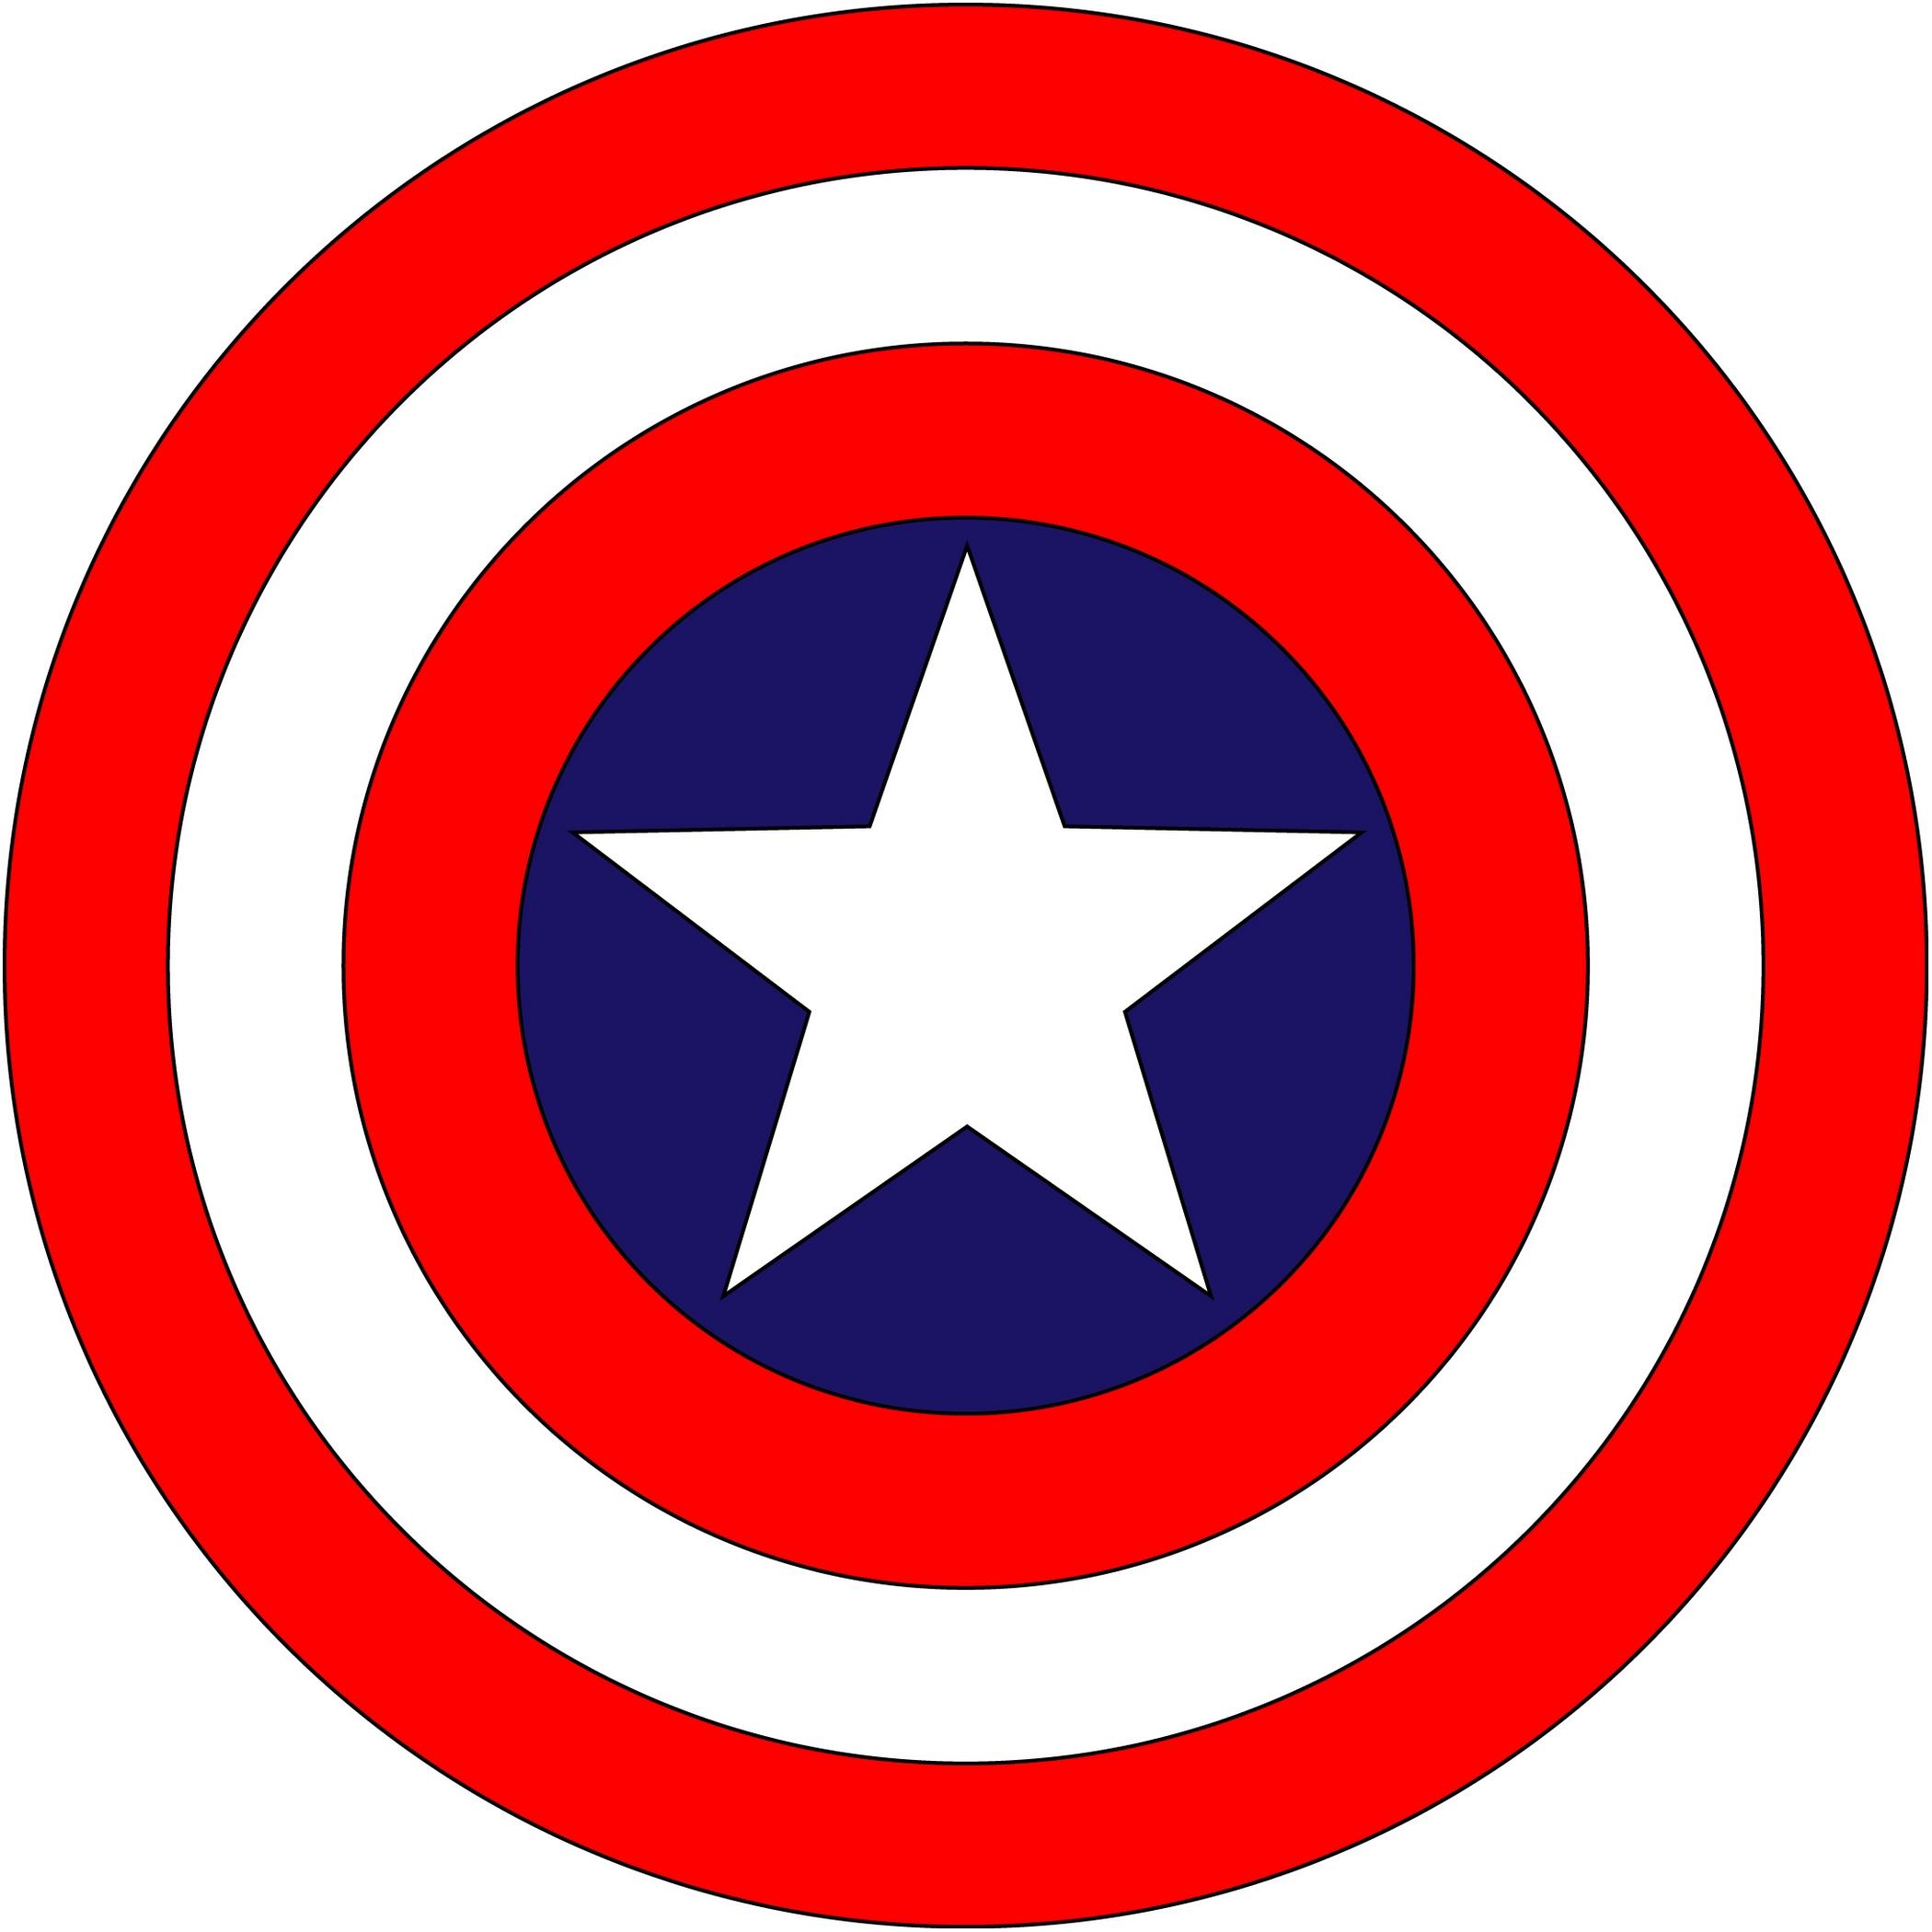 Captain marvel logo clipart picture black and white Captain america logo clip art - ClipartFest picture black and white